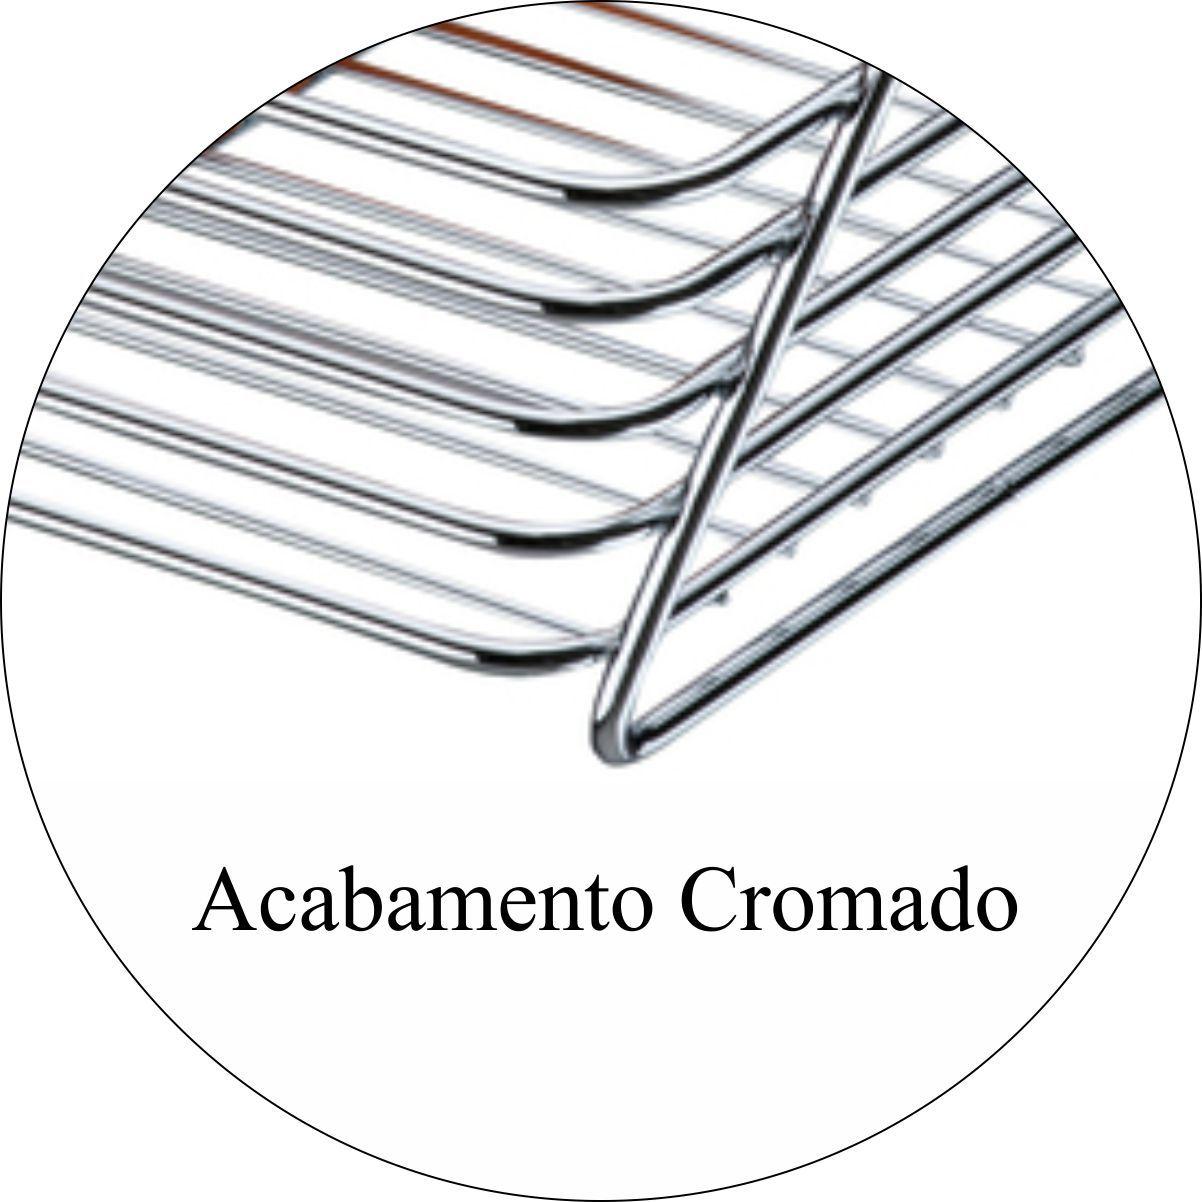 Cesto Multiuso De Bancada 31 x 23 cm - Cromado